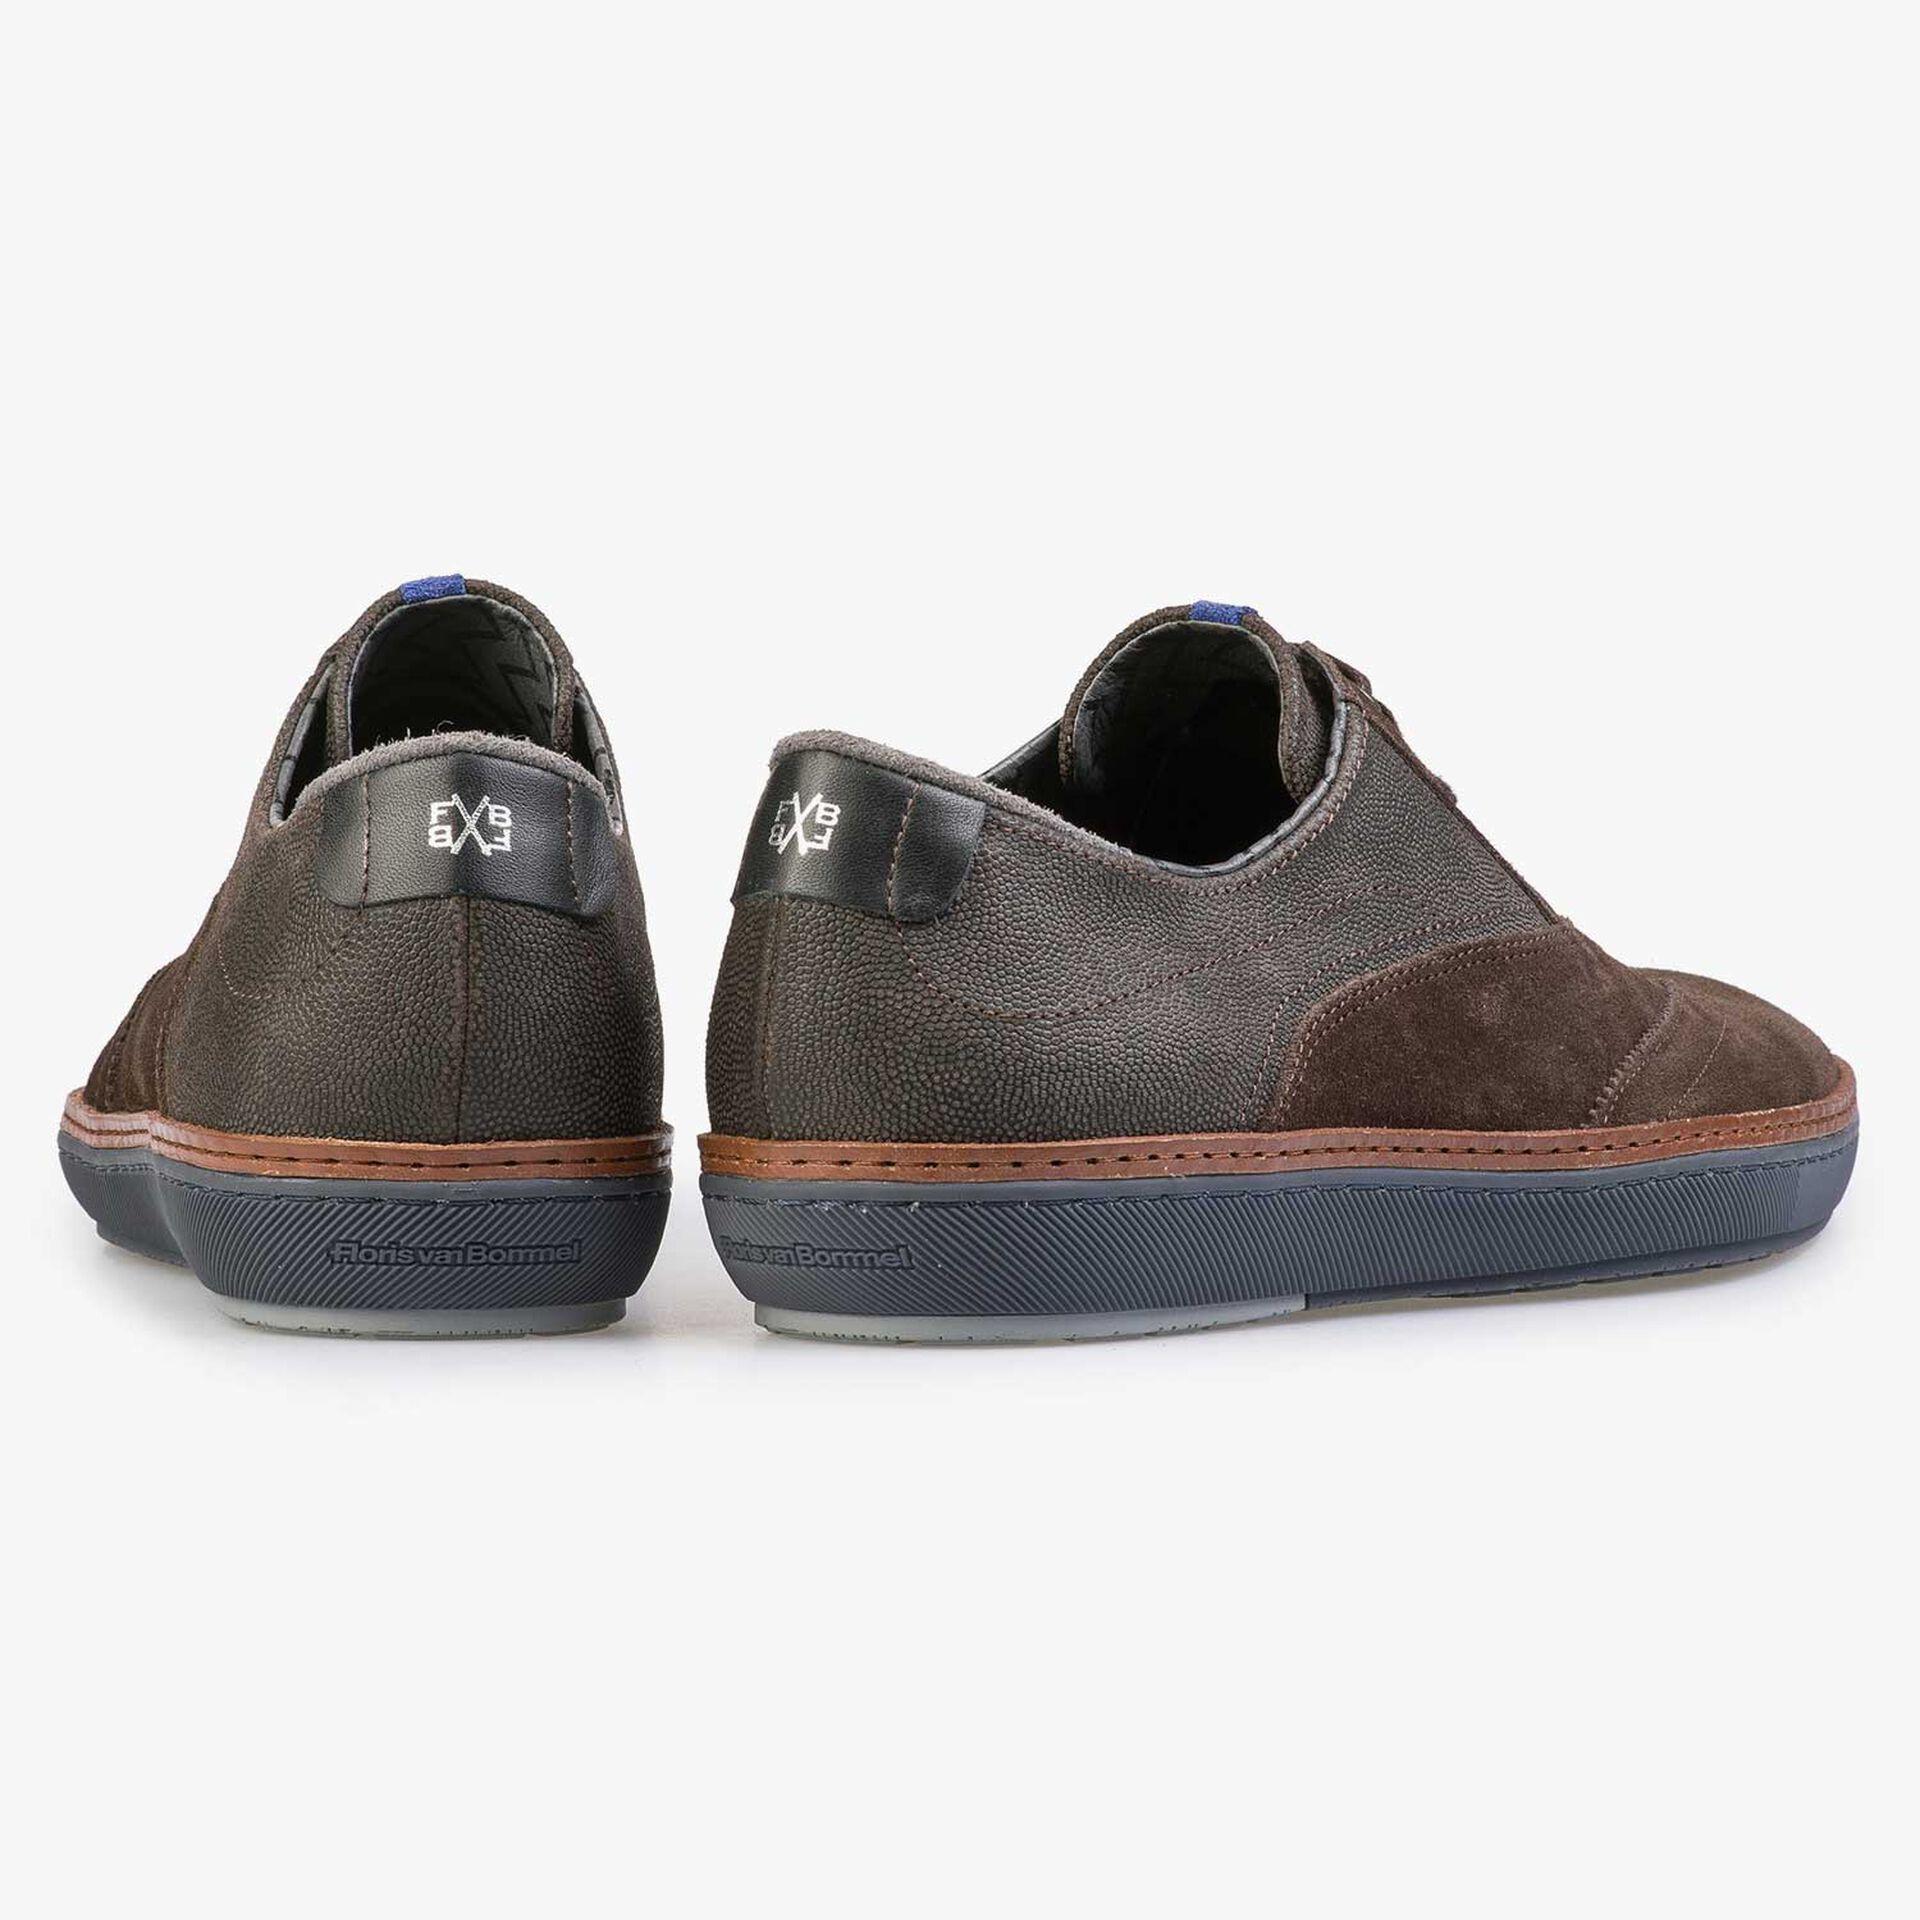 Brauner Brogue-Sneaker aus Kalbswildleder